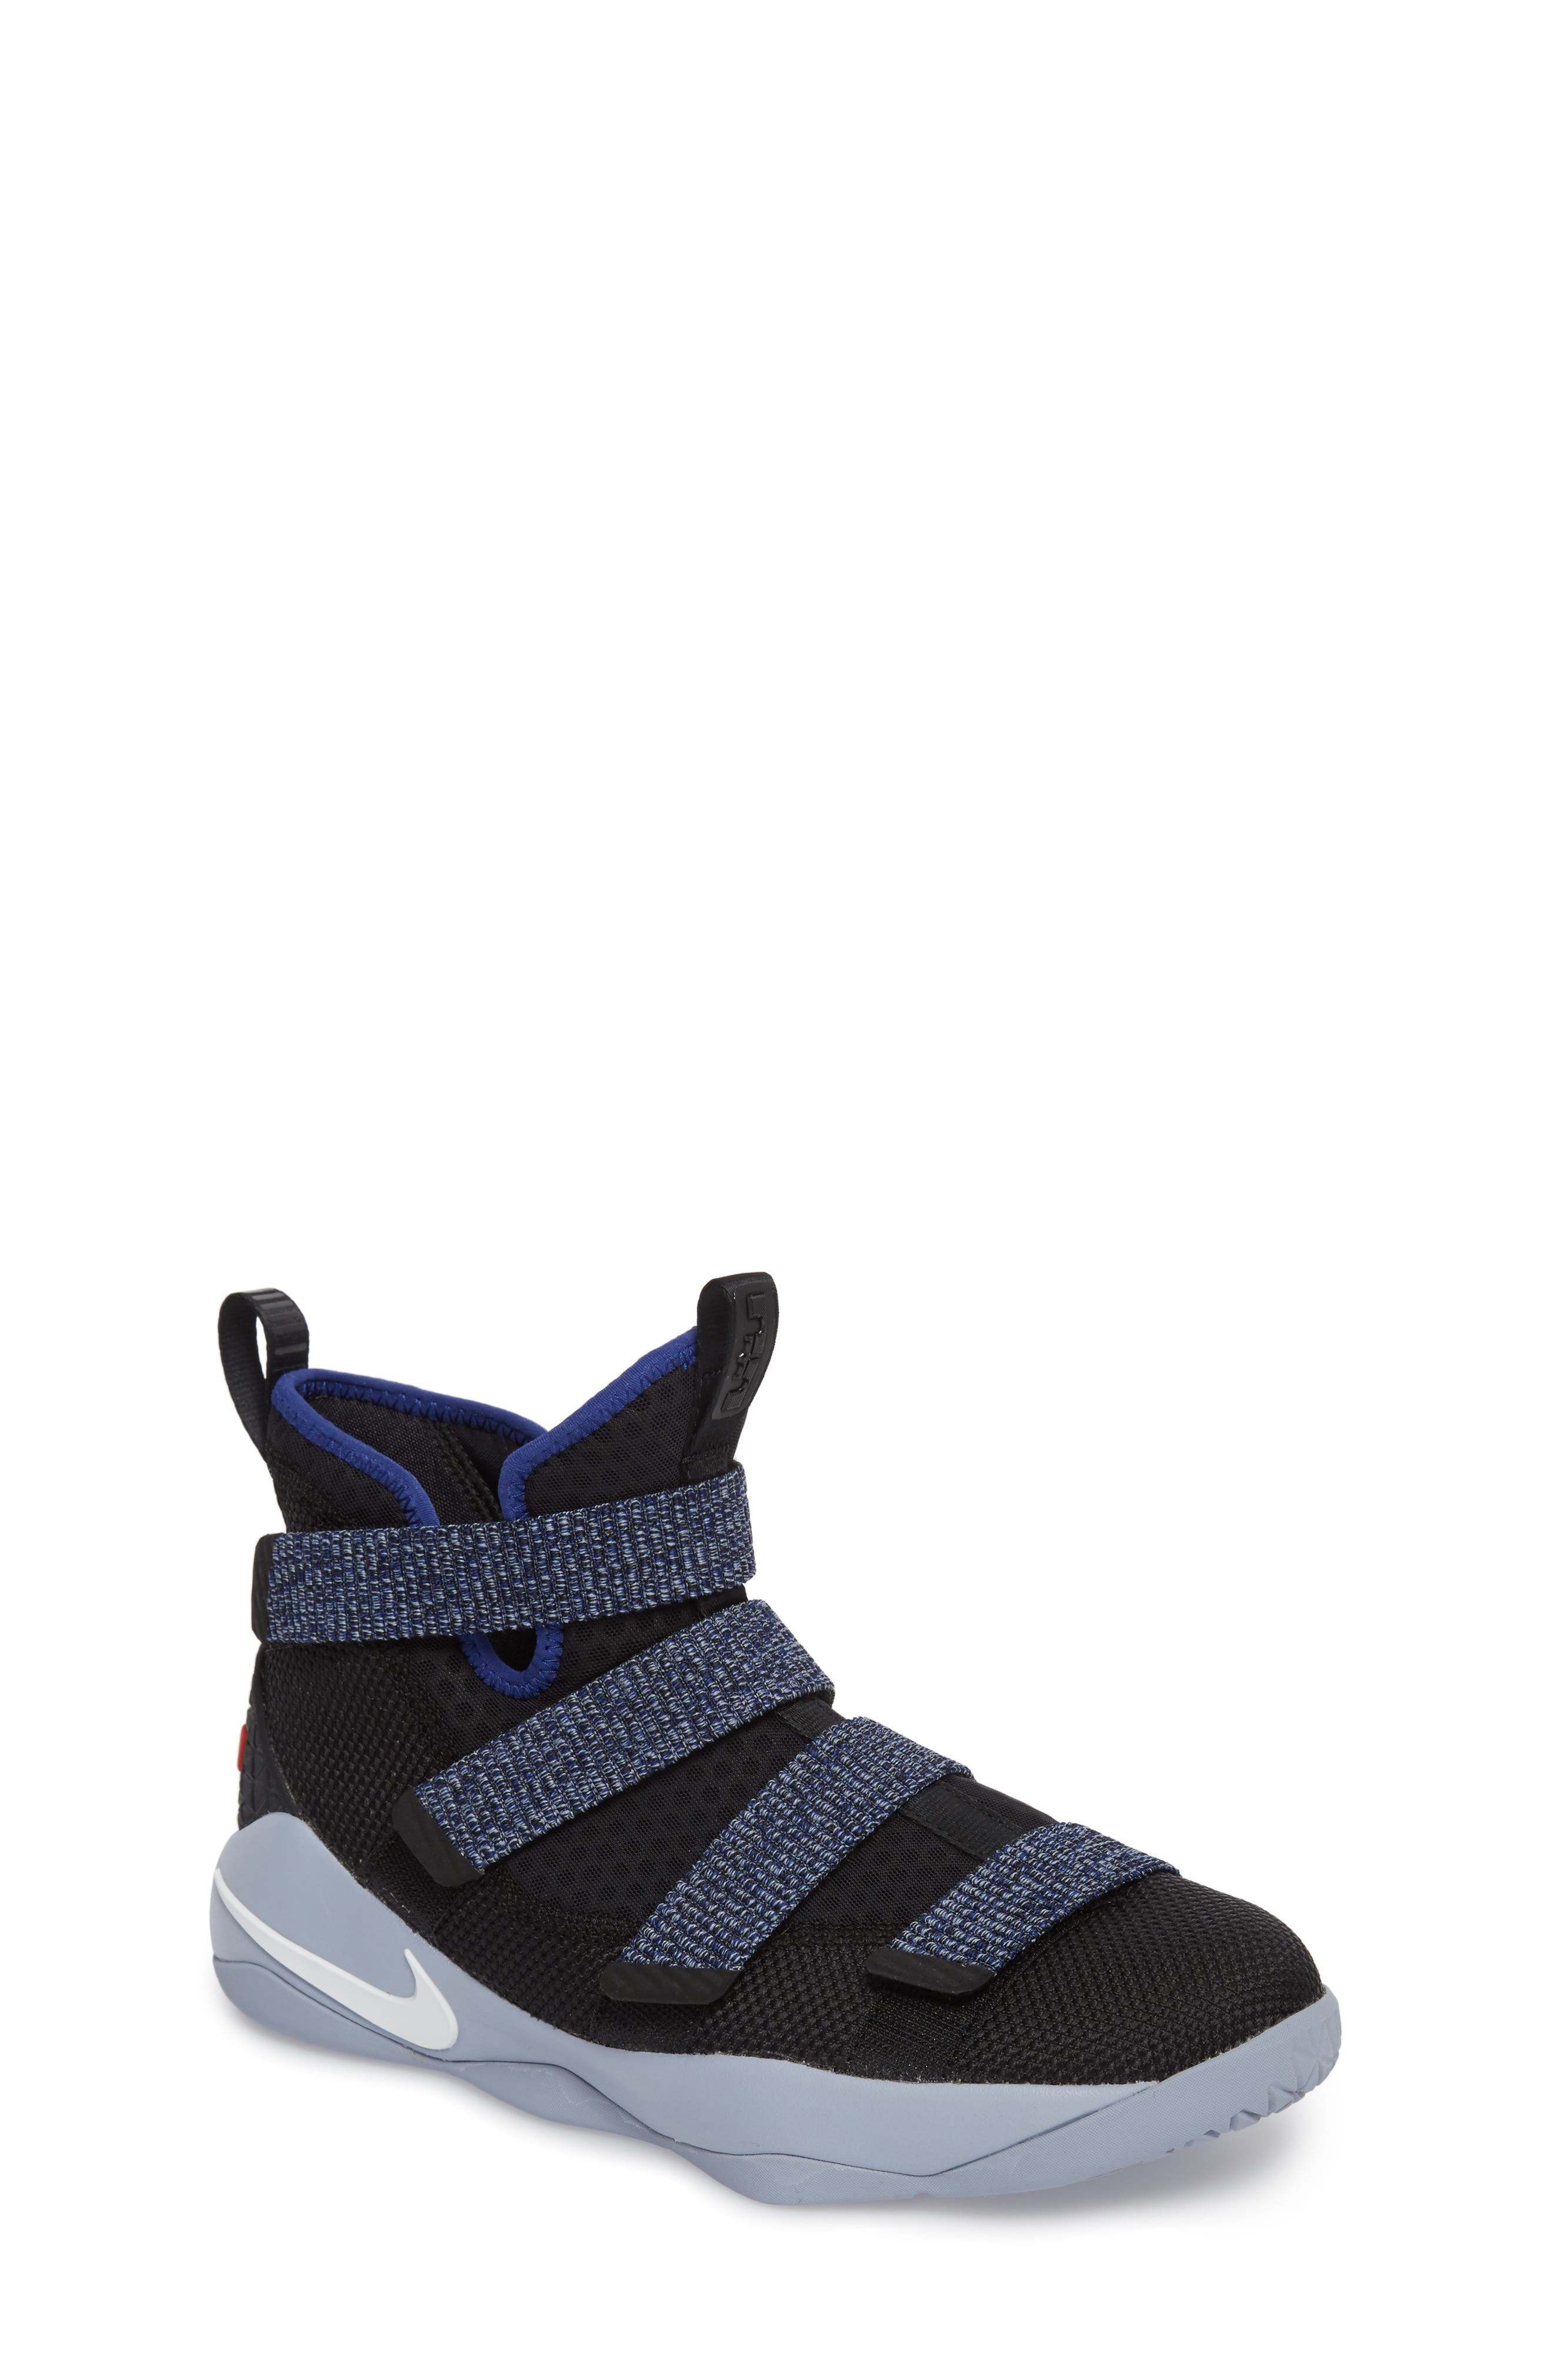 LeBron Soldier XI Basketball Shoe,                             Main thumbnail 1, color,                             005